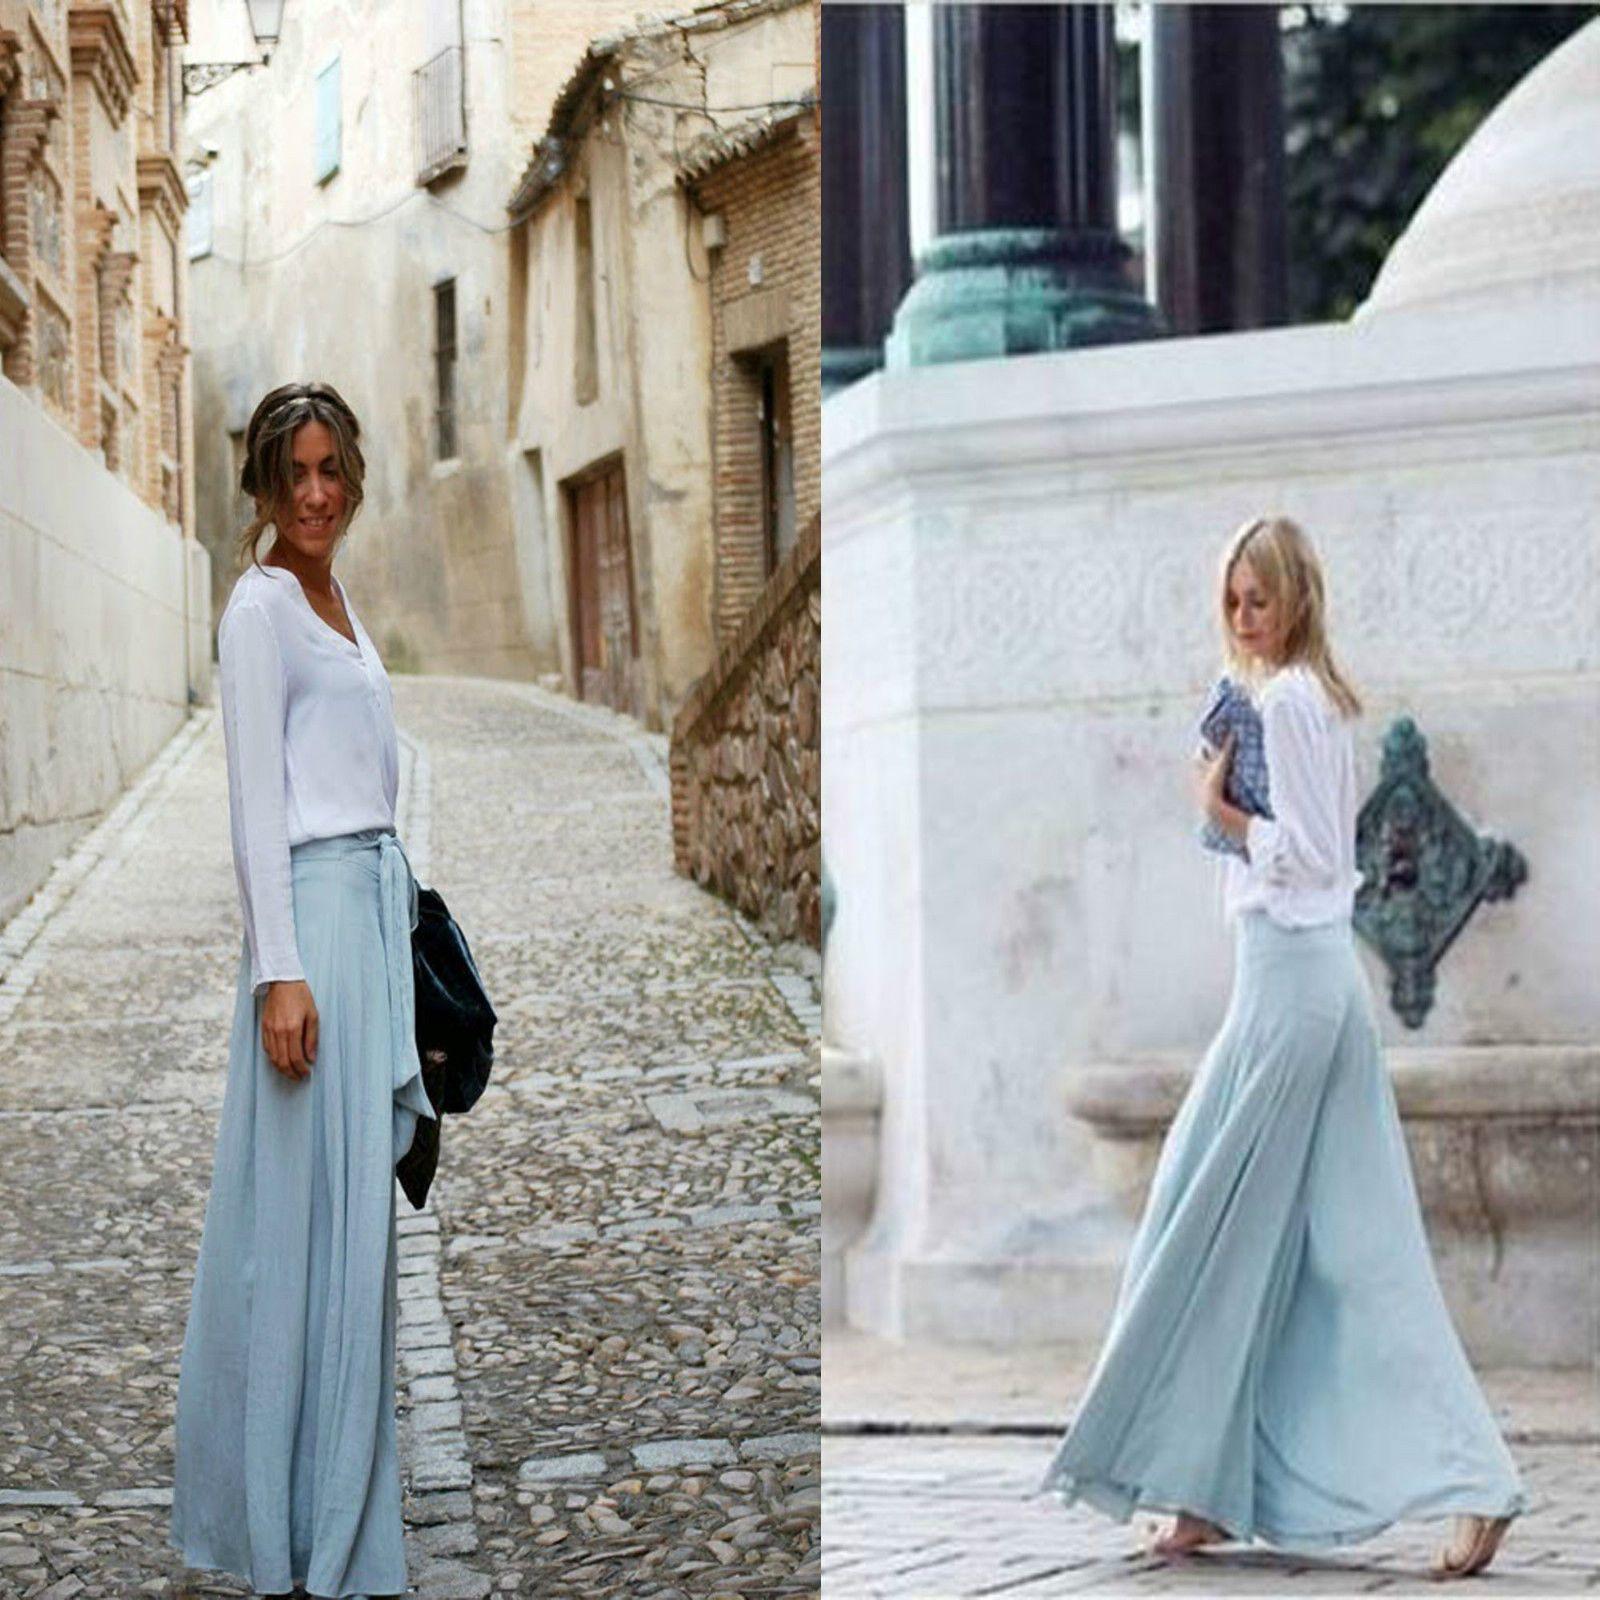 17886e4804 Zara Sky Light Blue Silky Wide Leg Palazzo Flowing Pants Trousers XS SML  Bloggs